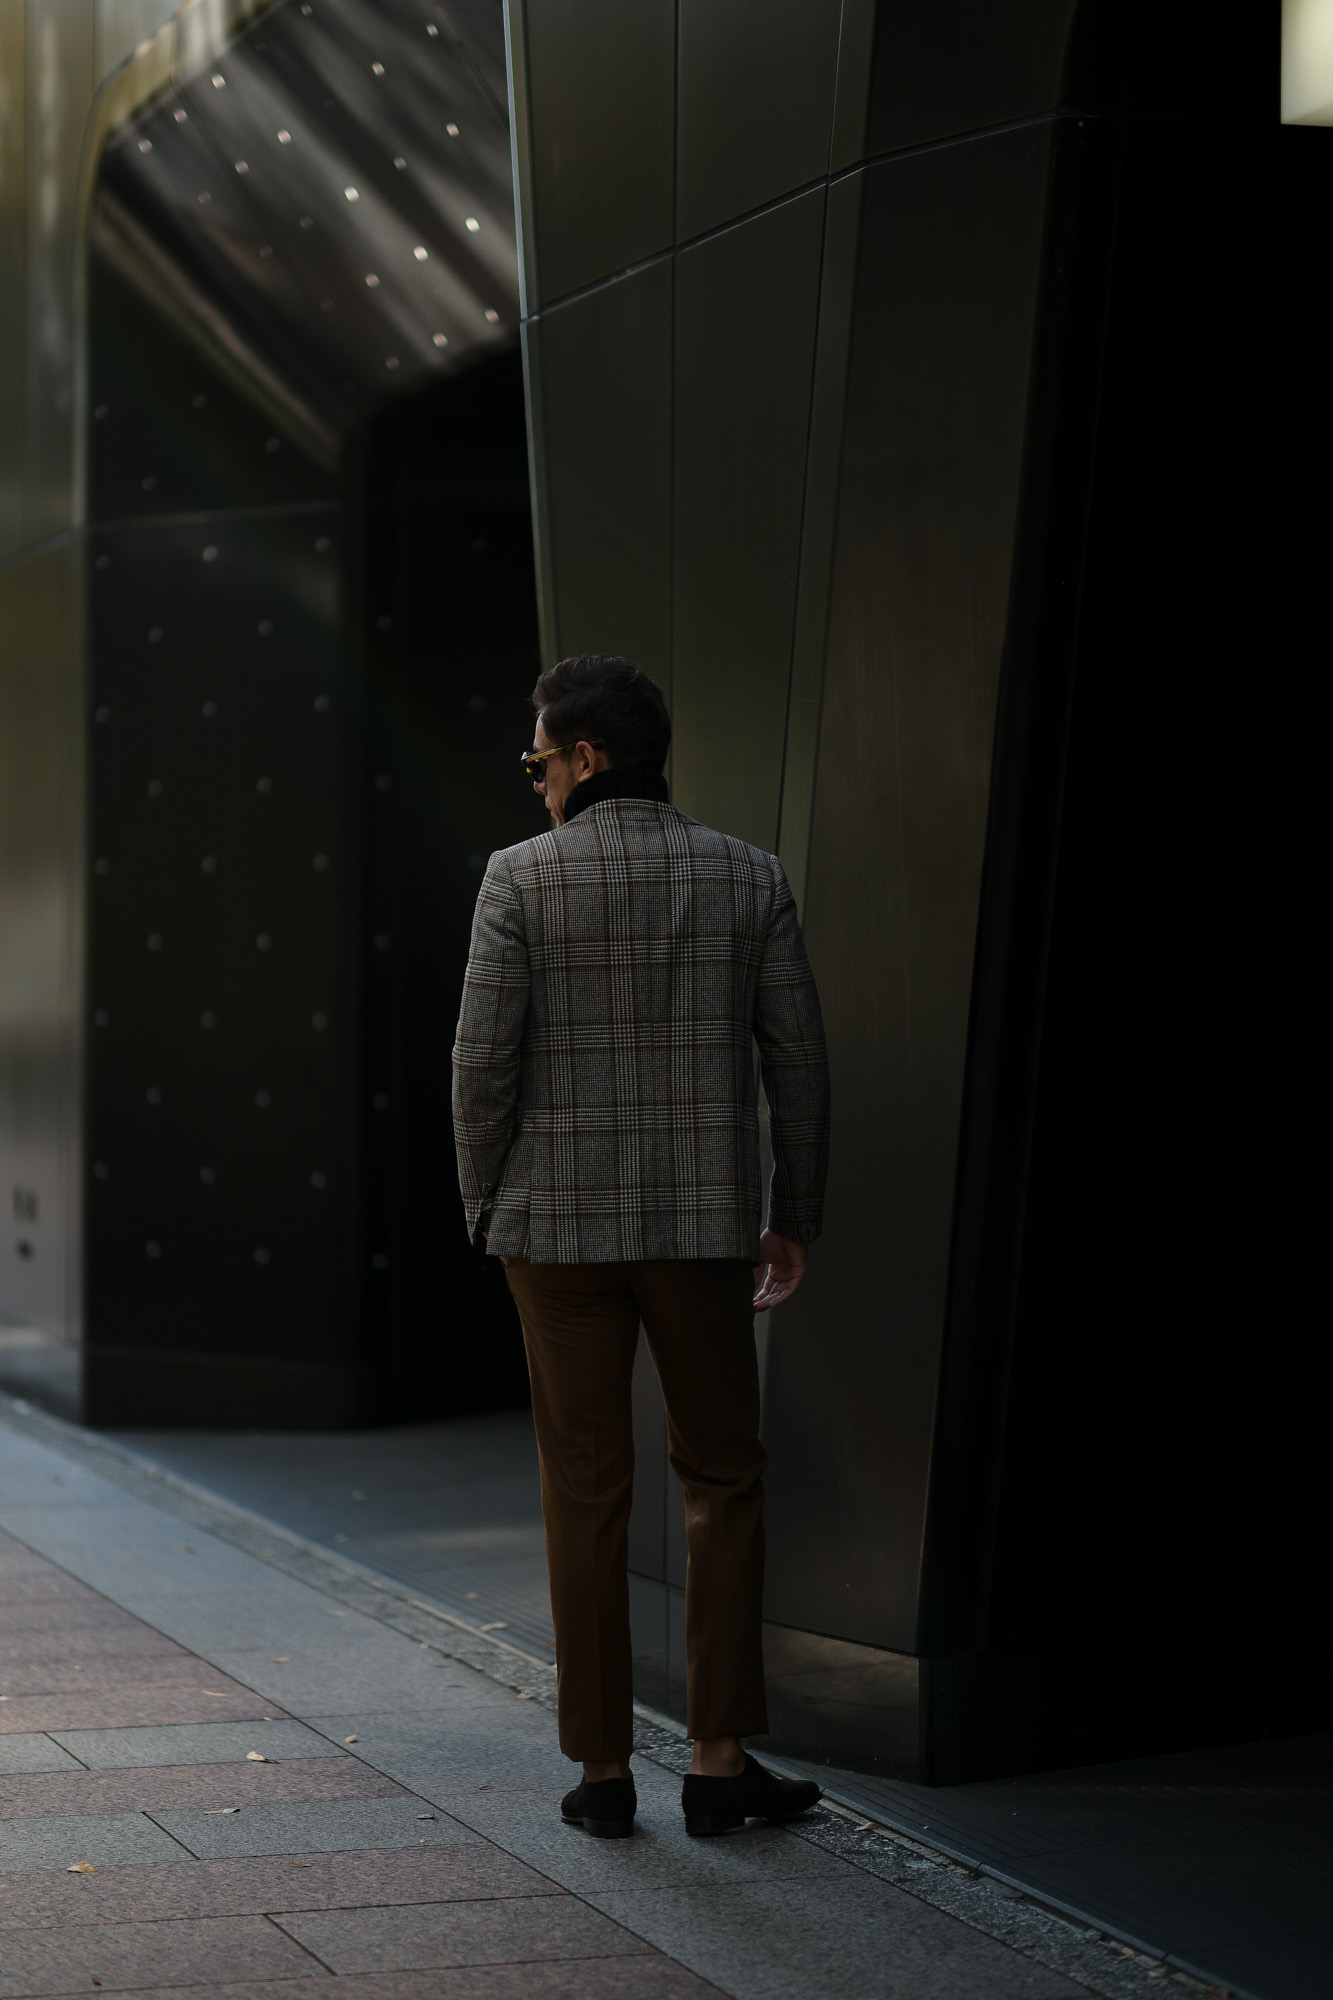 INCOTEX (インコテックス) N35 SLIM FIT (1NT035) SUPER 100'S CARDED FLANNEL フランネル ウール スラックス BROWN (ブラウン・640) 2018秋冬新作 愛知 名古屋 alto e diritto アルトエデリット 茶スラ